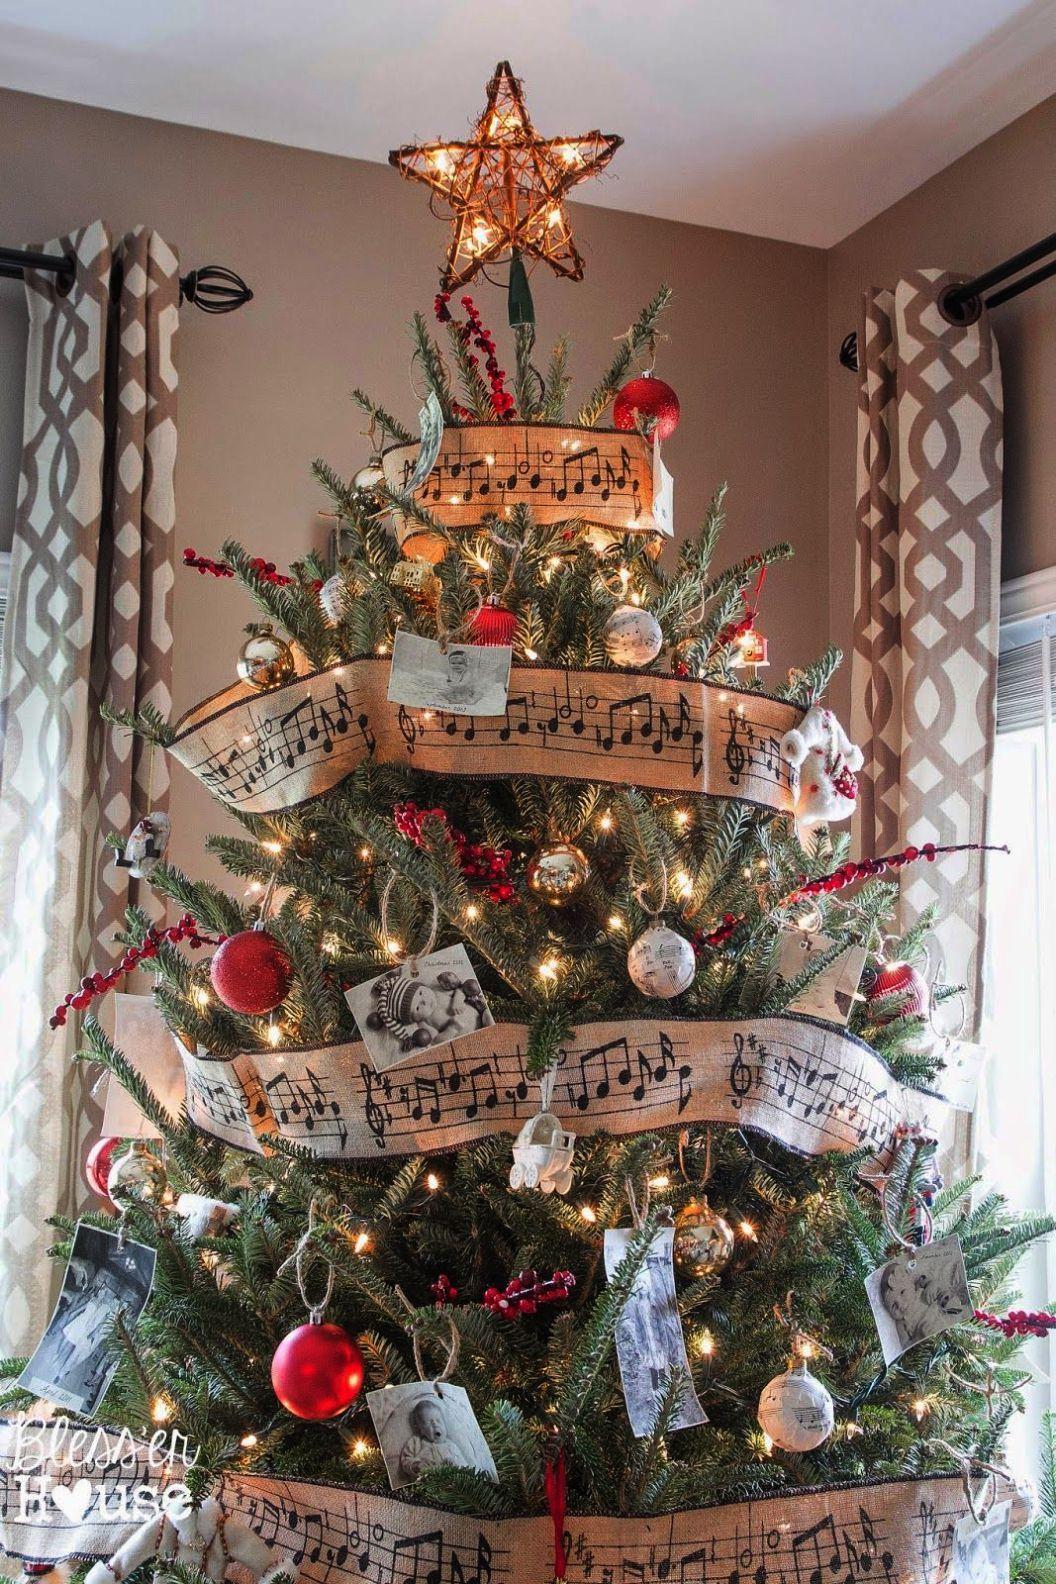 Christmas Cards Last Minute Both French Christmas Home Decor Inside Christmas Music On Pandor Christmas Tree Themes Cheap Christmas Trees Christmas Decorations